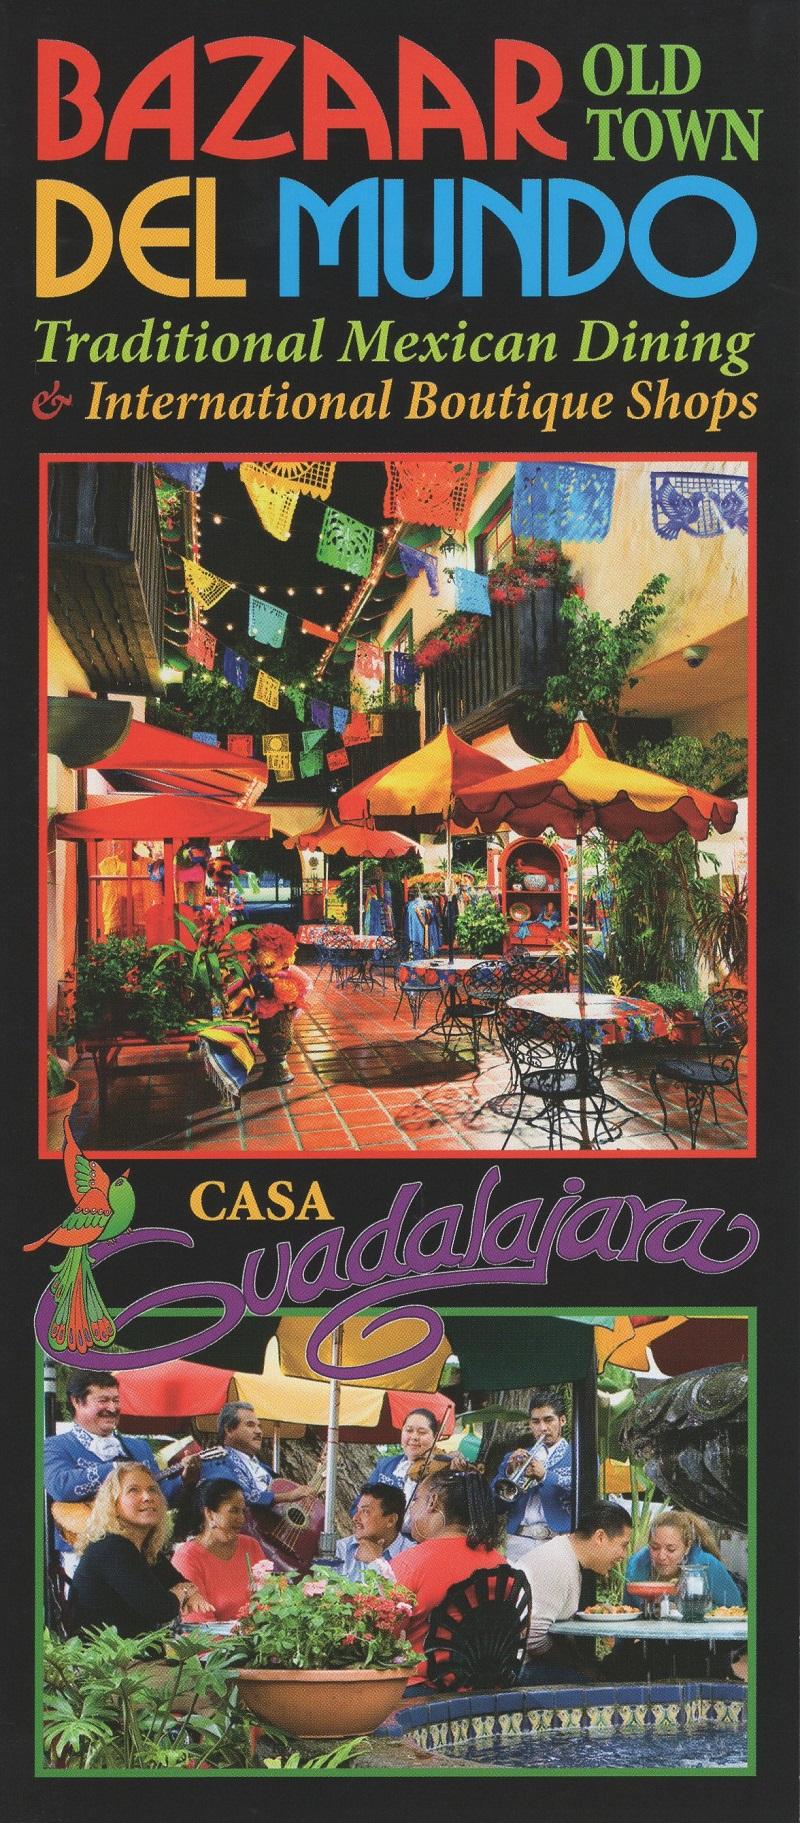 Bazaar Del Mundo/Casa Guadalajara